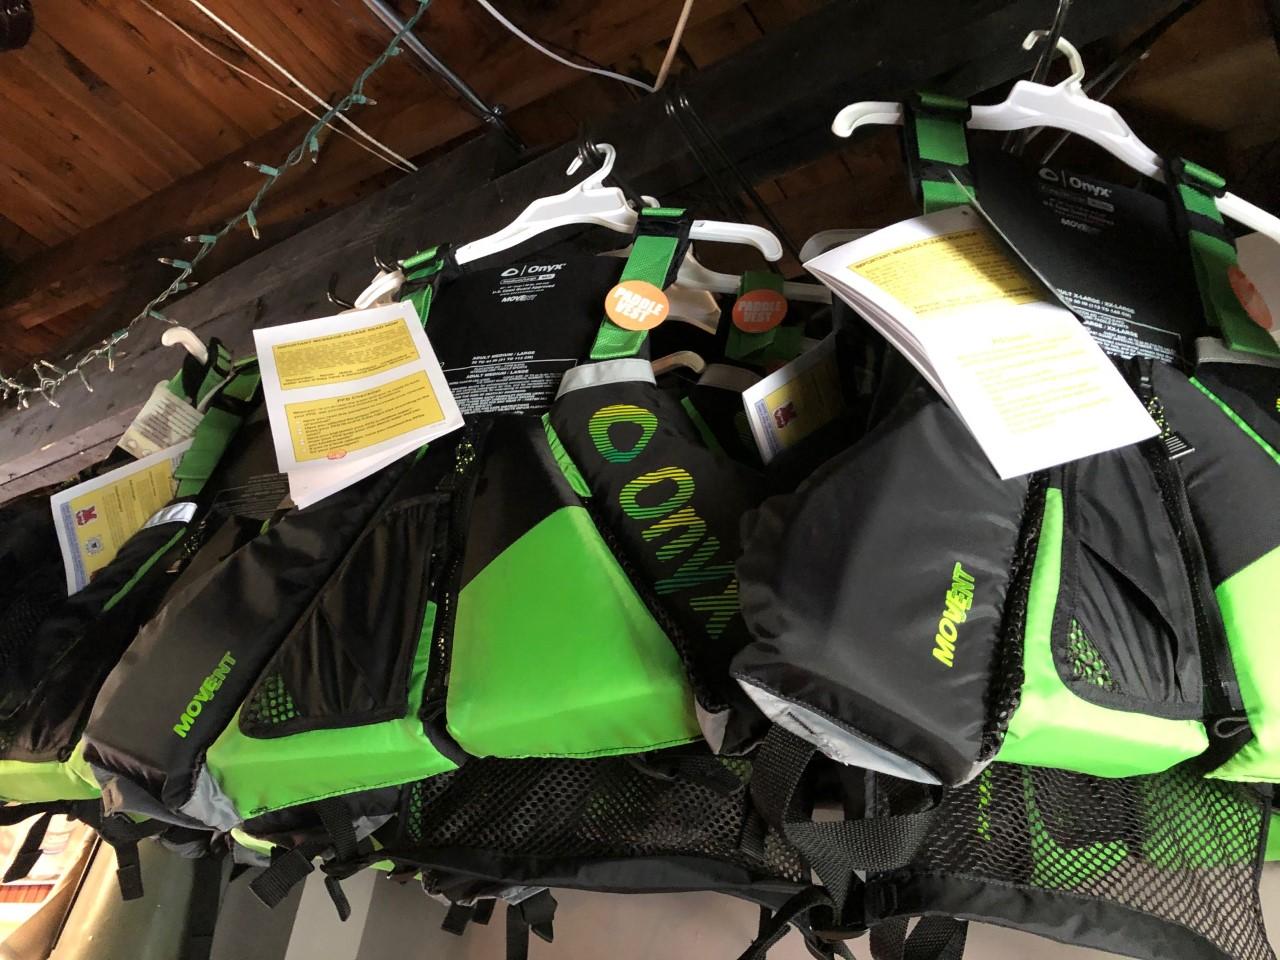 Onyx Paddle Vest Green PFDl/2xl